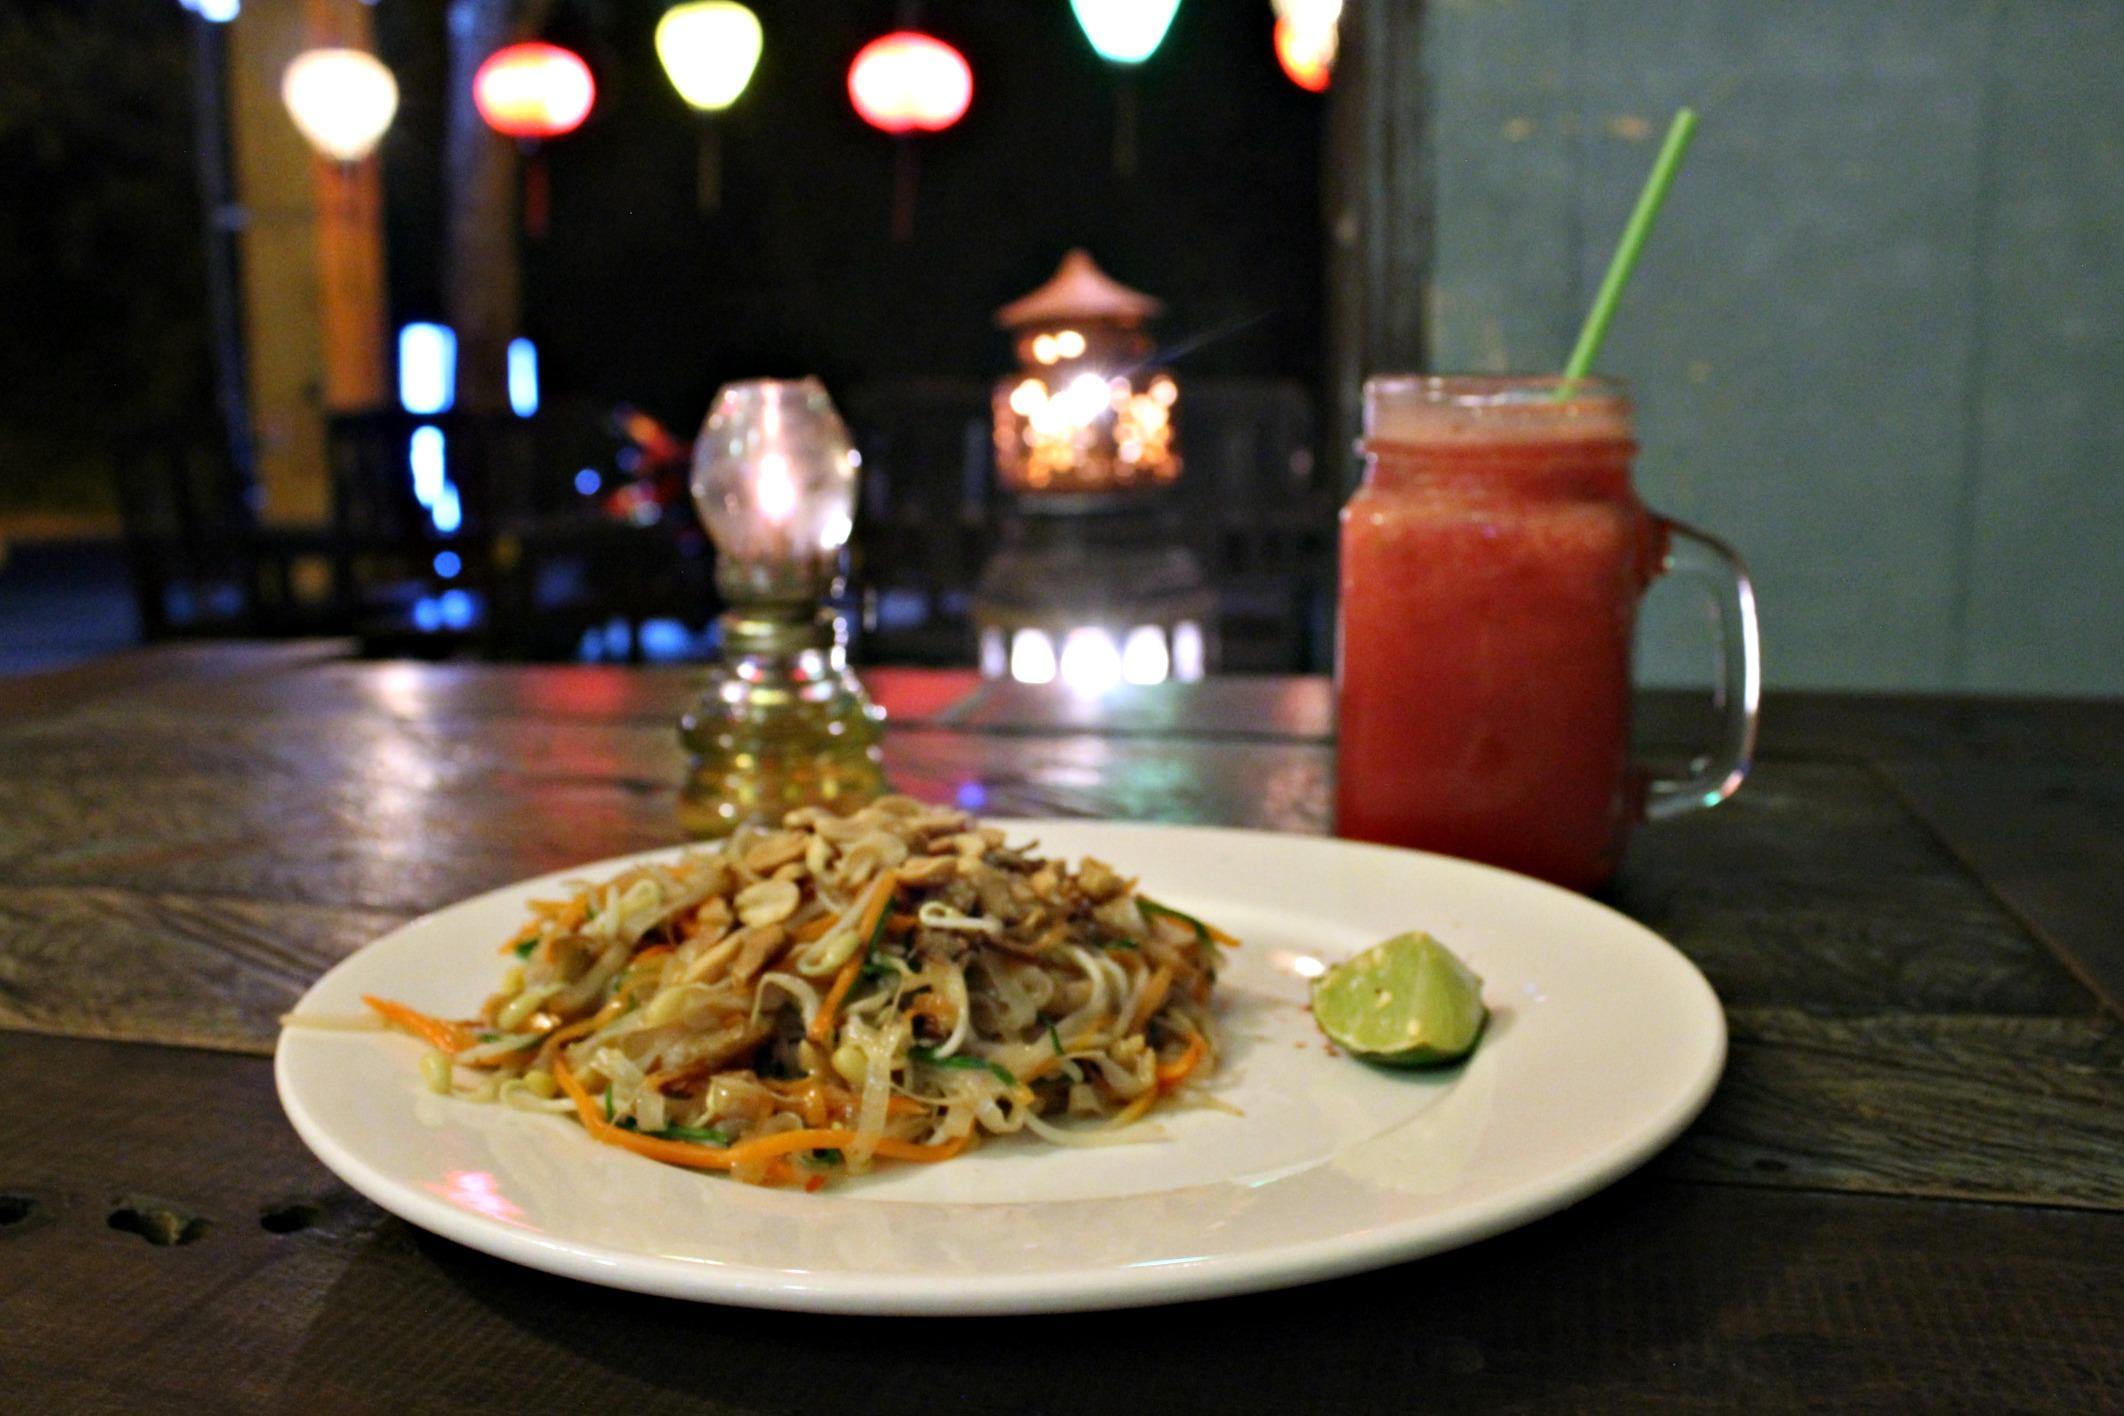 vegan Pad Thai and watermelon juice at Am Restaurant